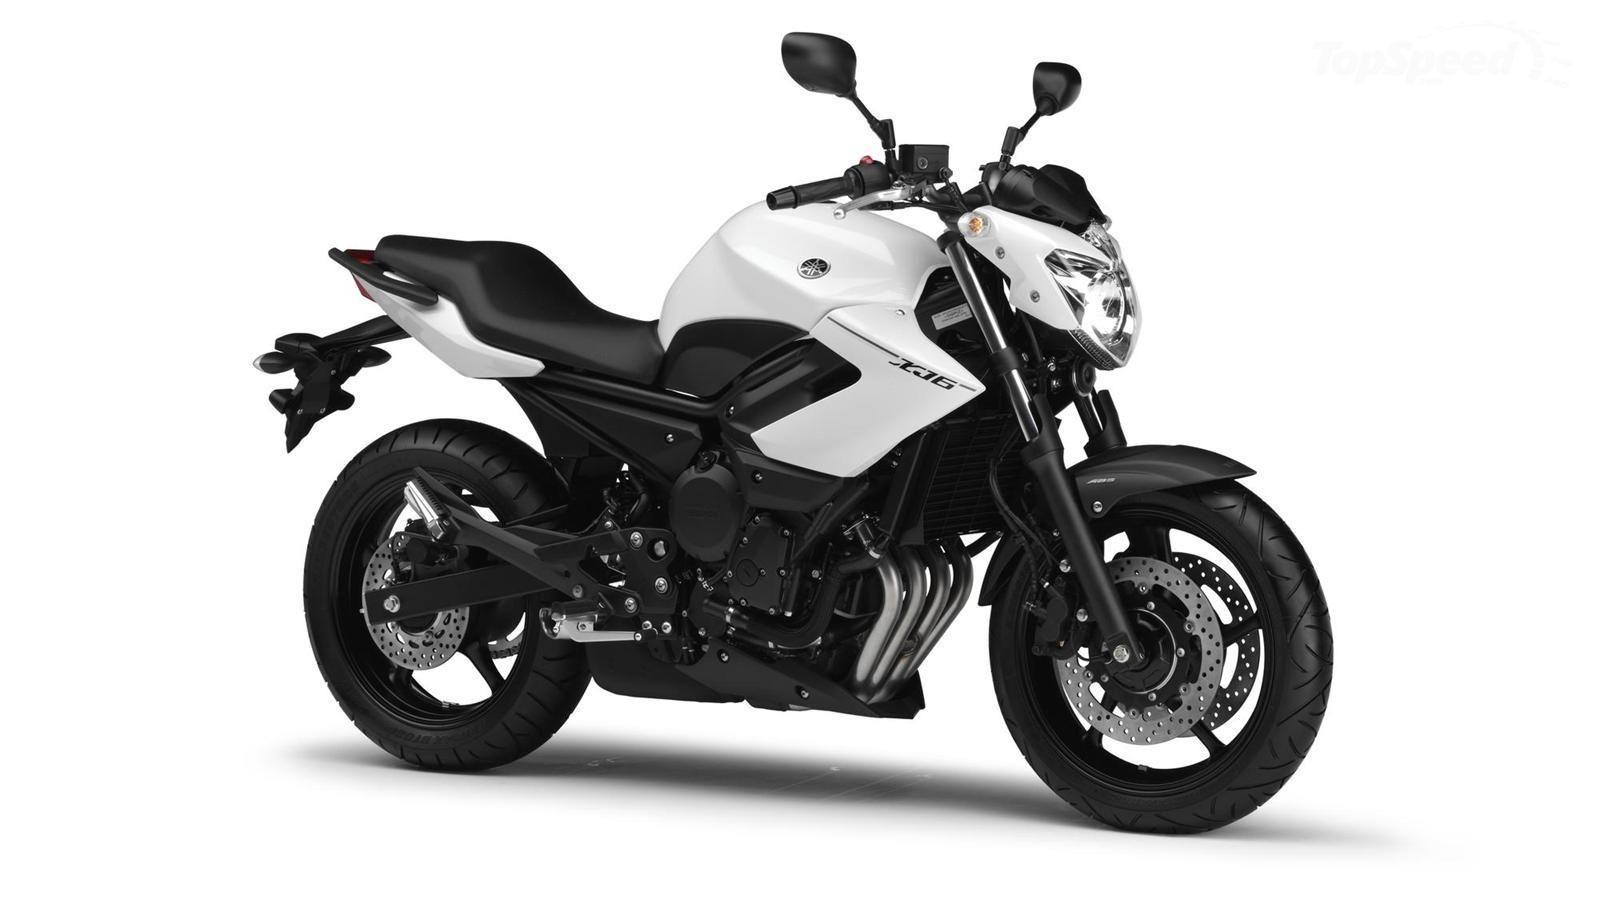 Moto yamaha scrambler cars motorcycles bobber forward mt09 yamaha - 2013 Yamaha Xj6 Abs Picture Doc501257